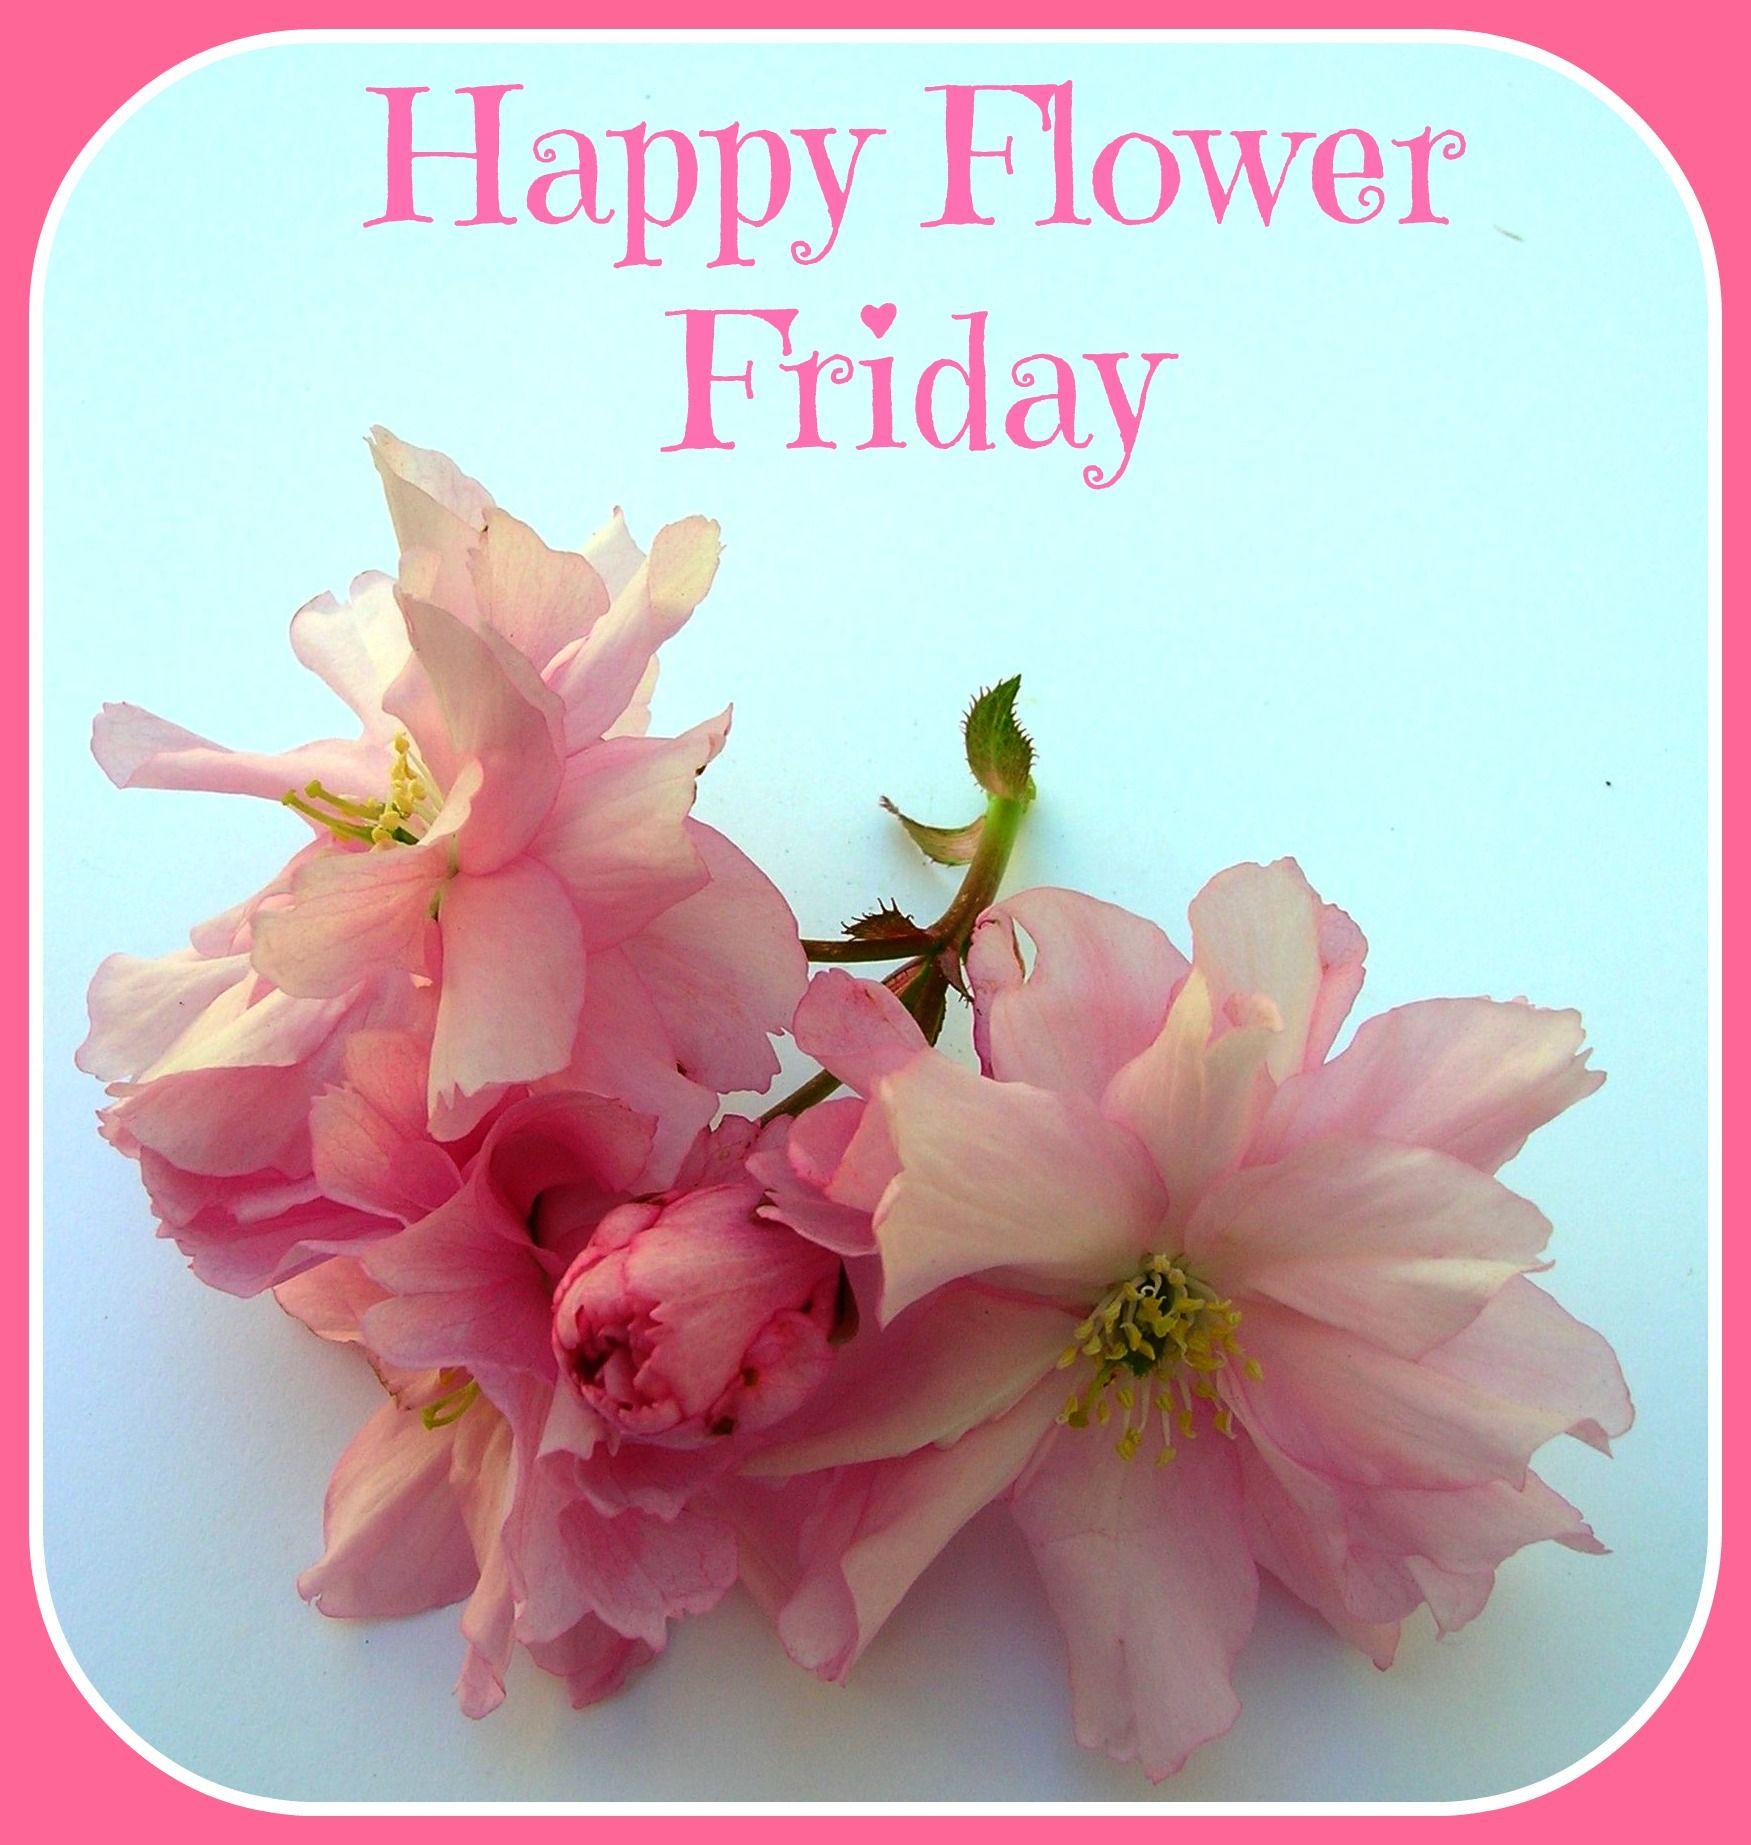 Happy Flower Friday Flowers Flowerfriday Pink Blue Flower